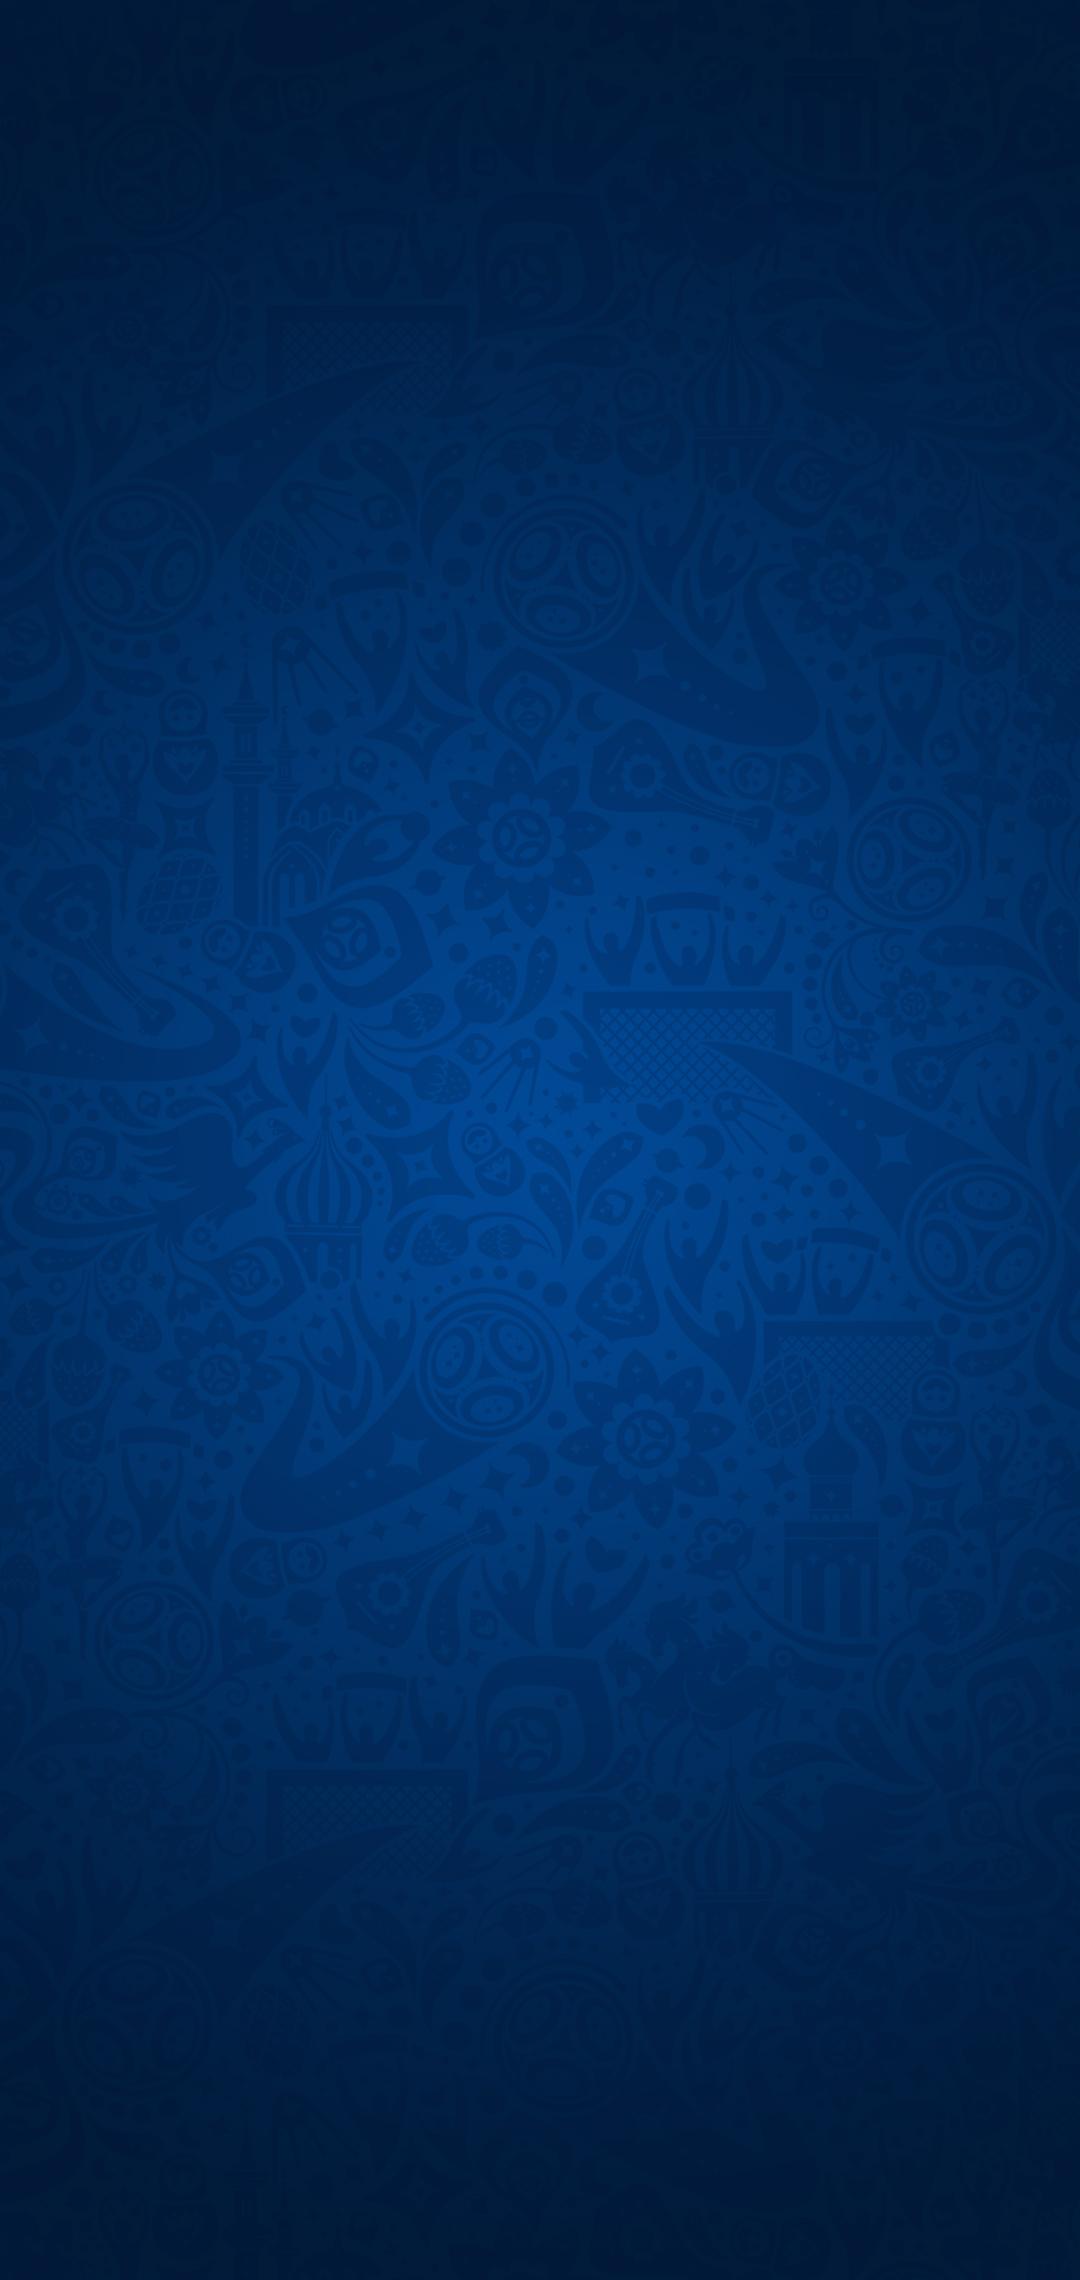 Iphone X Stock Wallpaper Zip Download Vivo X21 Stock Wallpapers Updated Droidviews